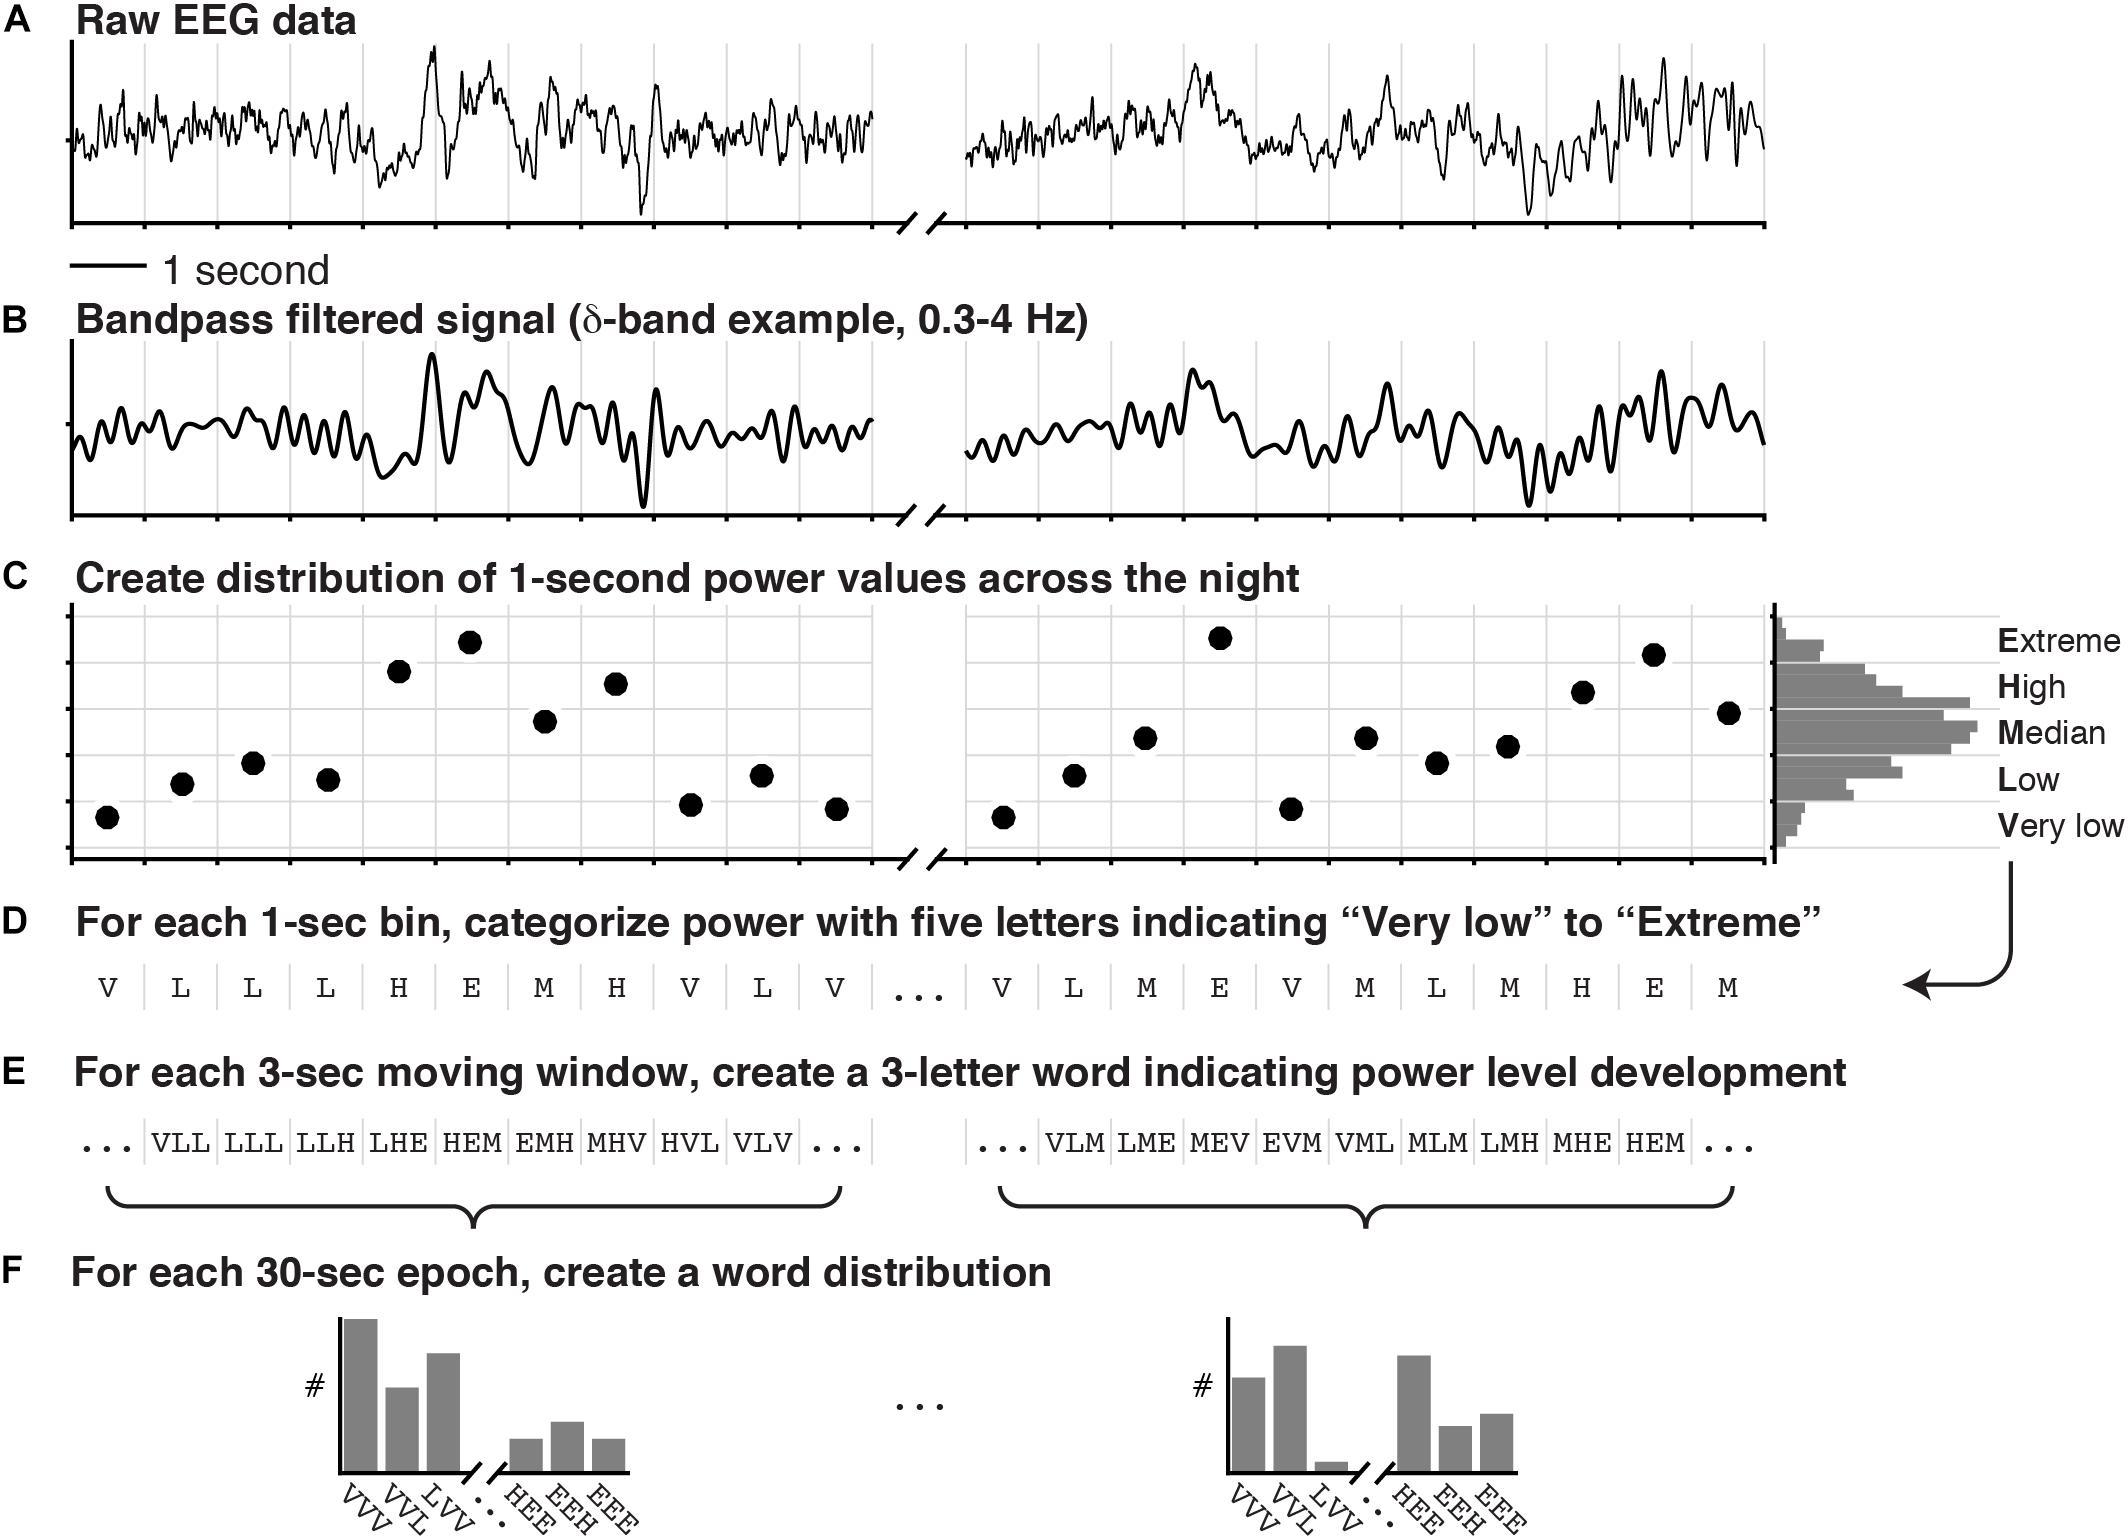 Frontiers | Data-Driven Analysis of EEG Reveals Concomitant